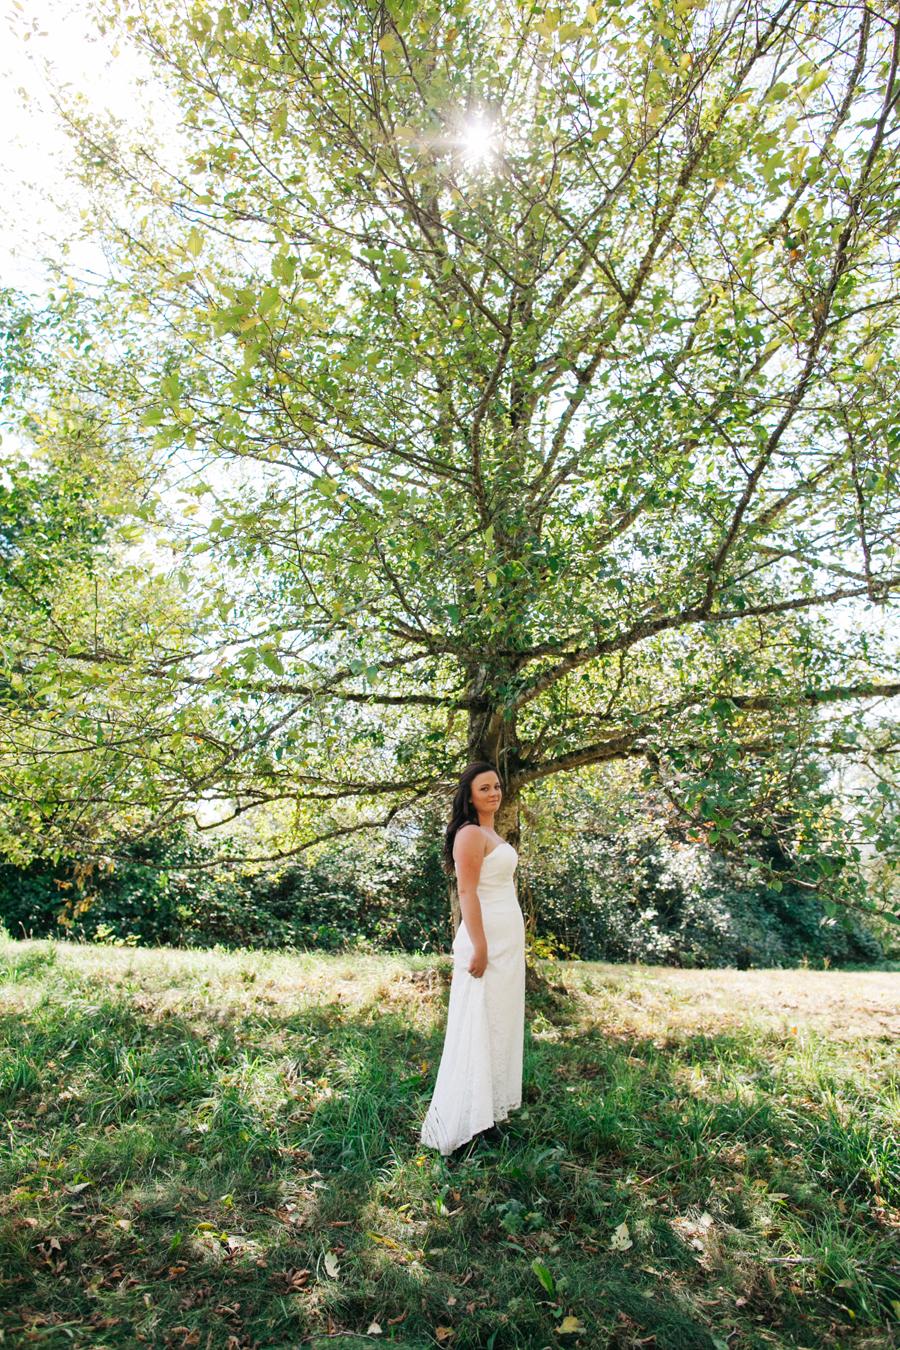 095-bellingham-wedding-photographer-everson-backyard-wedding.jpg